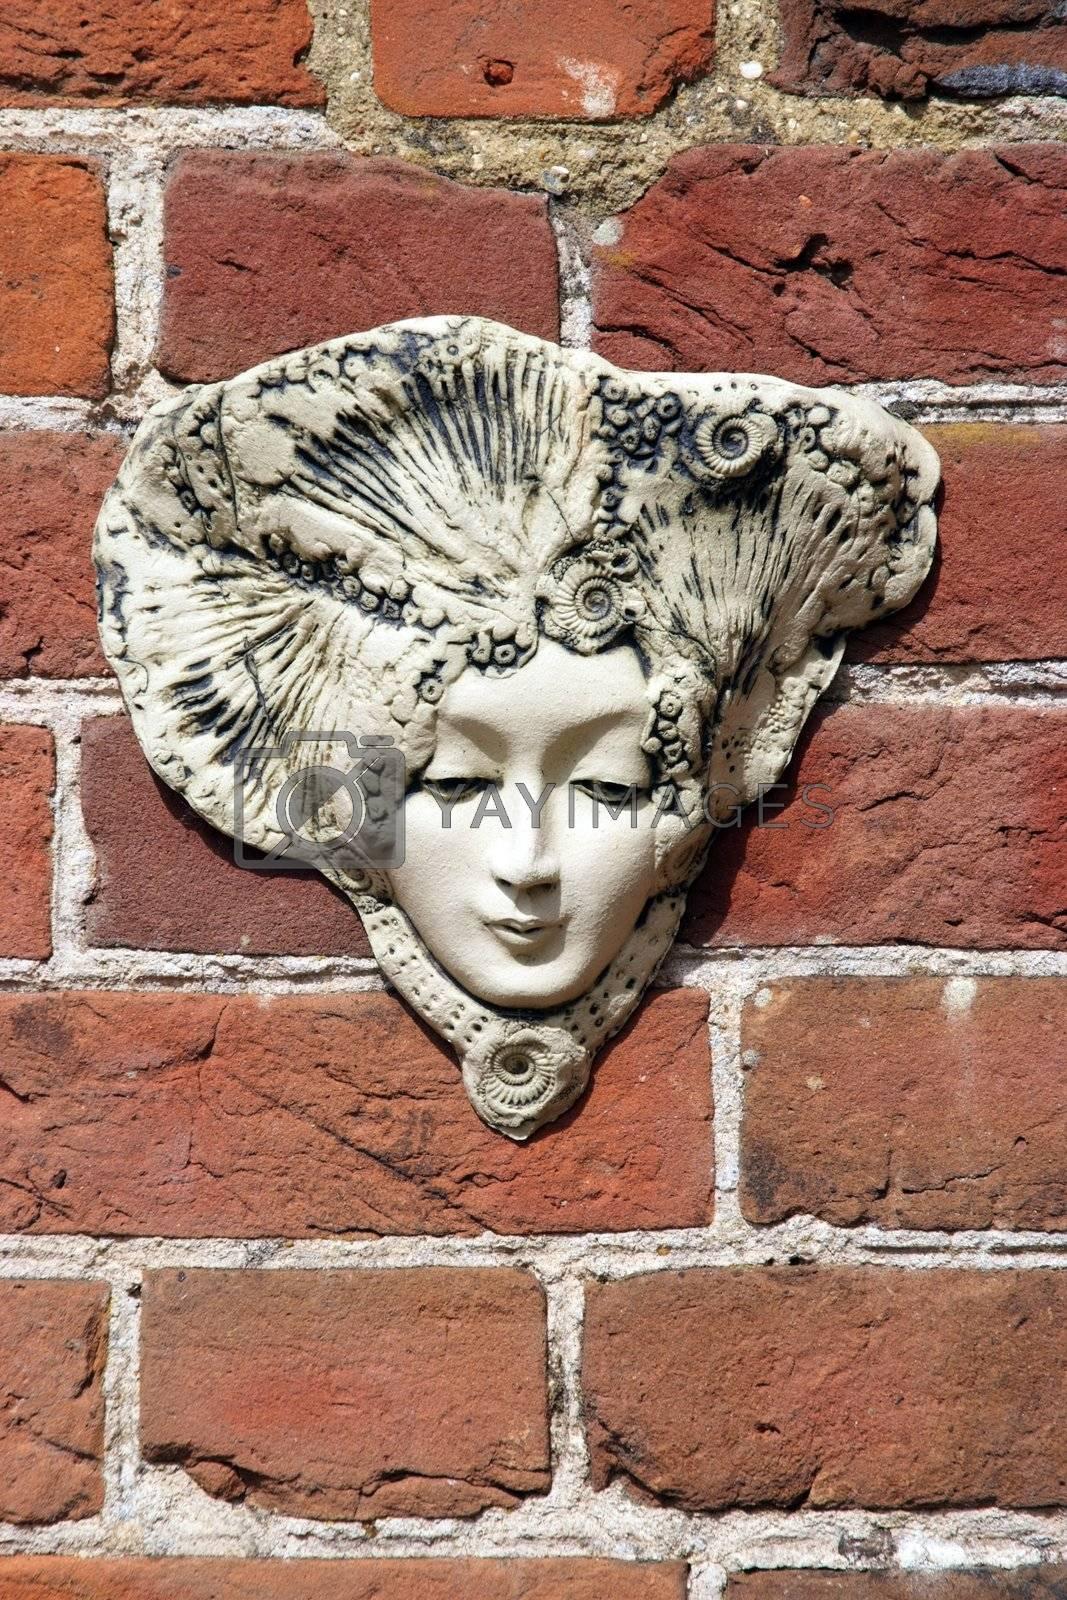 Decorative plant holder on a brick wall